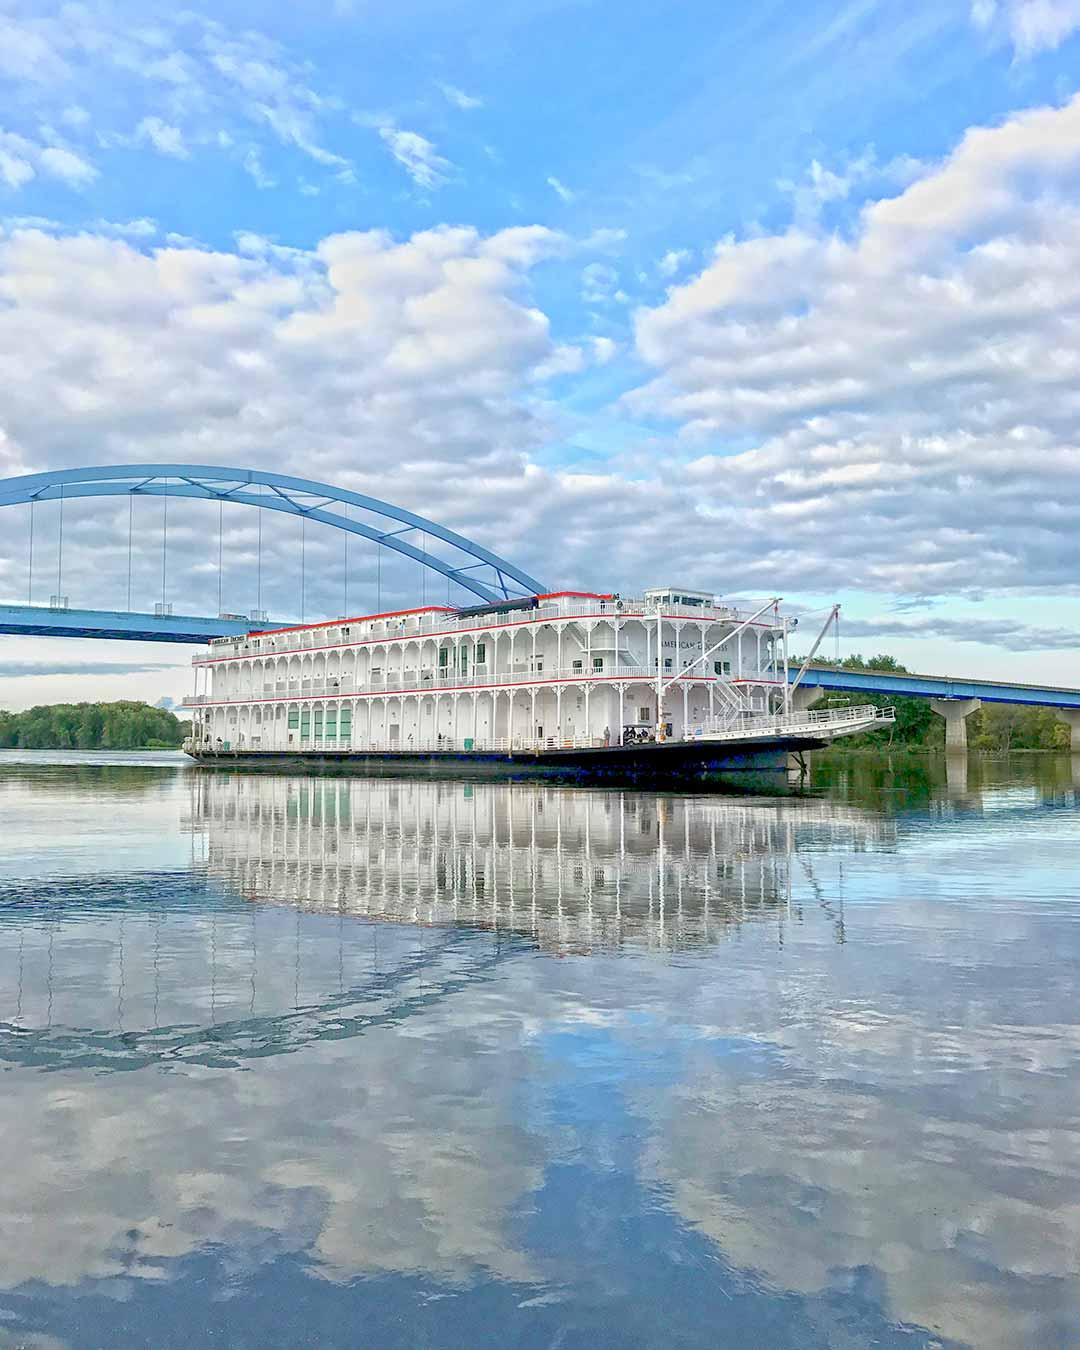 amqsb-river-boat-1080x1350